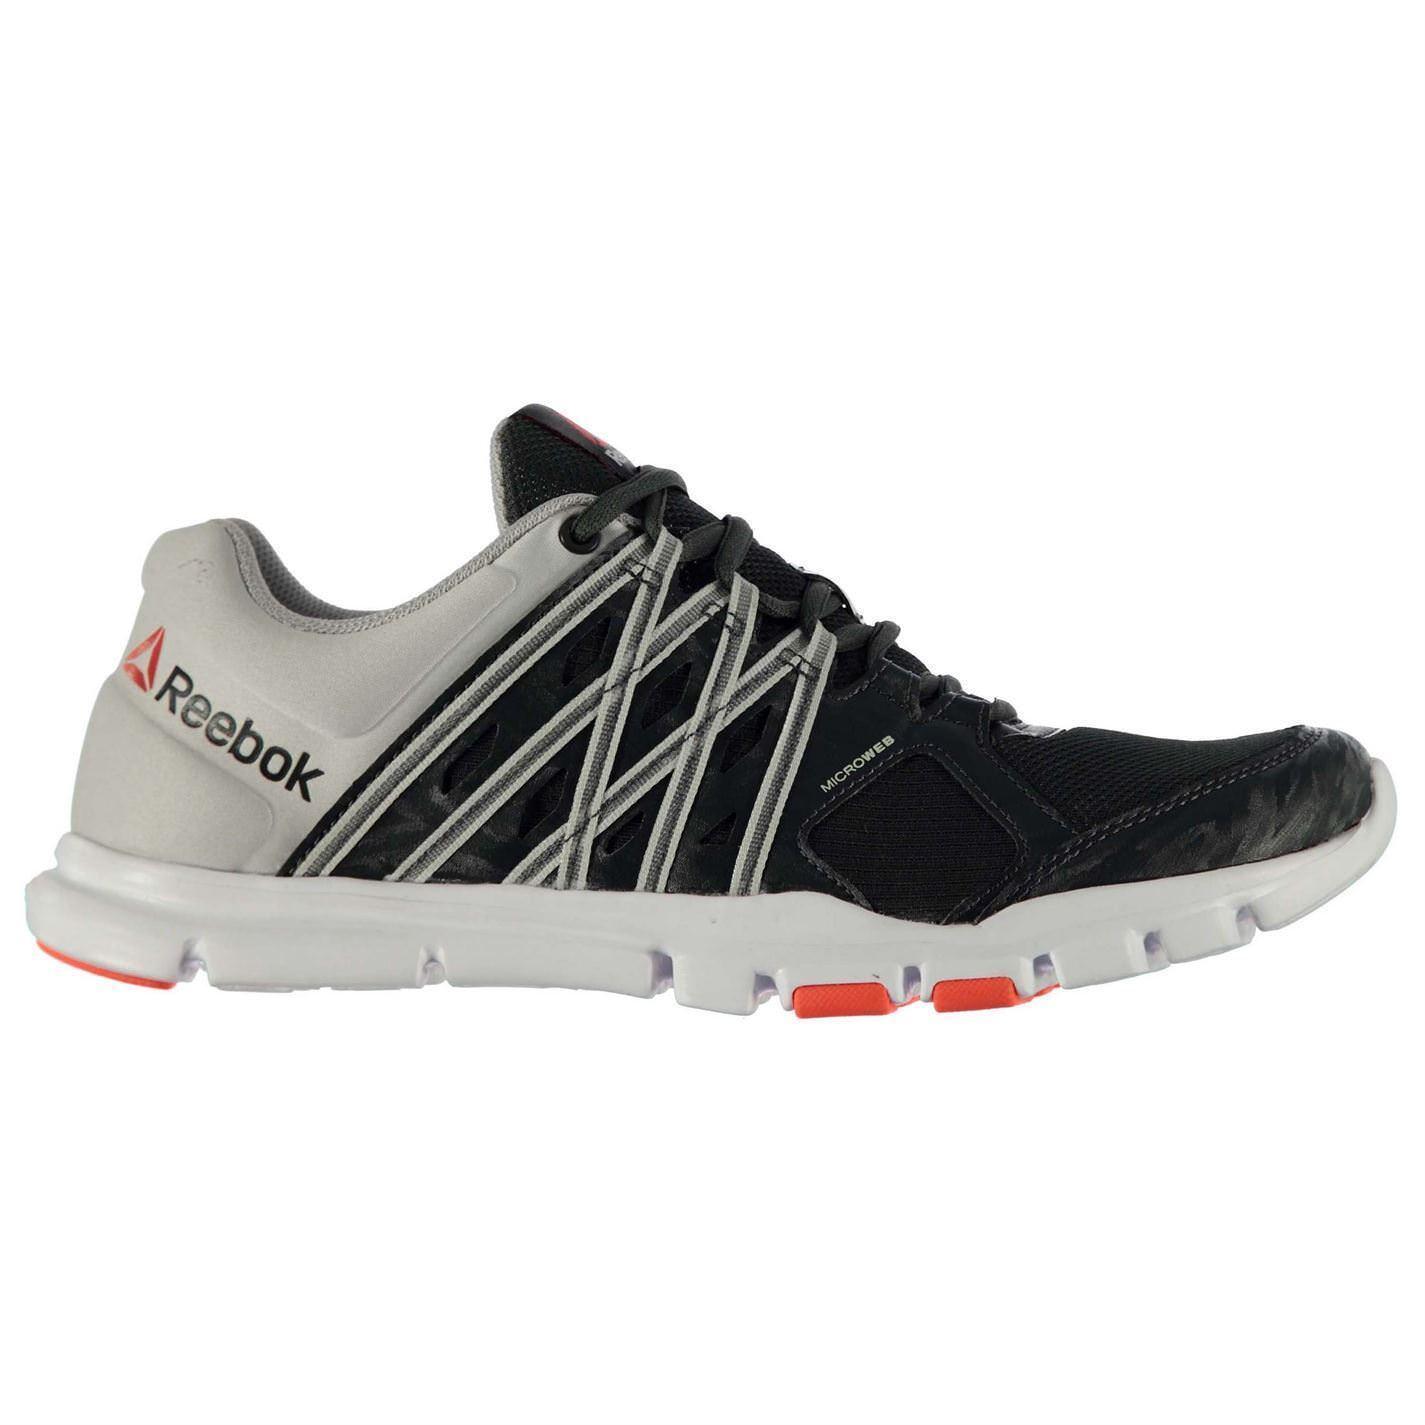 Reebok YourFlex 8 Trainers Mens Gravel/Steel/Red Sports Shoes Sneakers Footwear